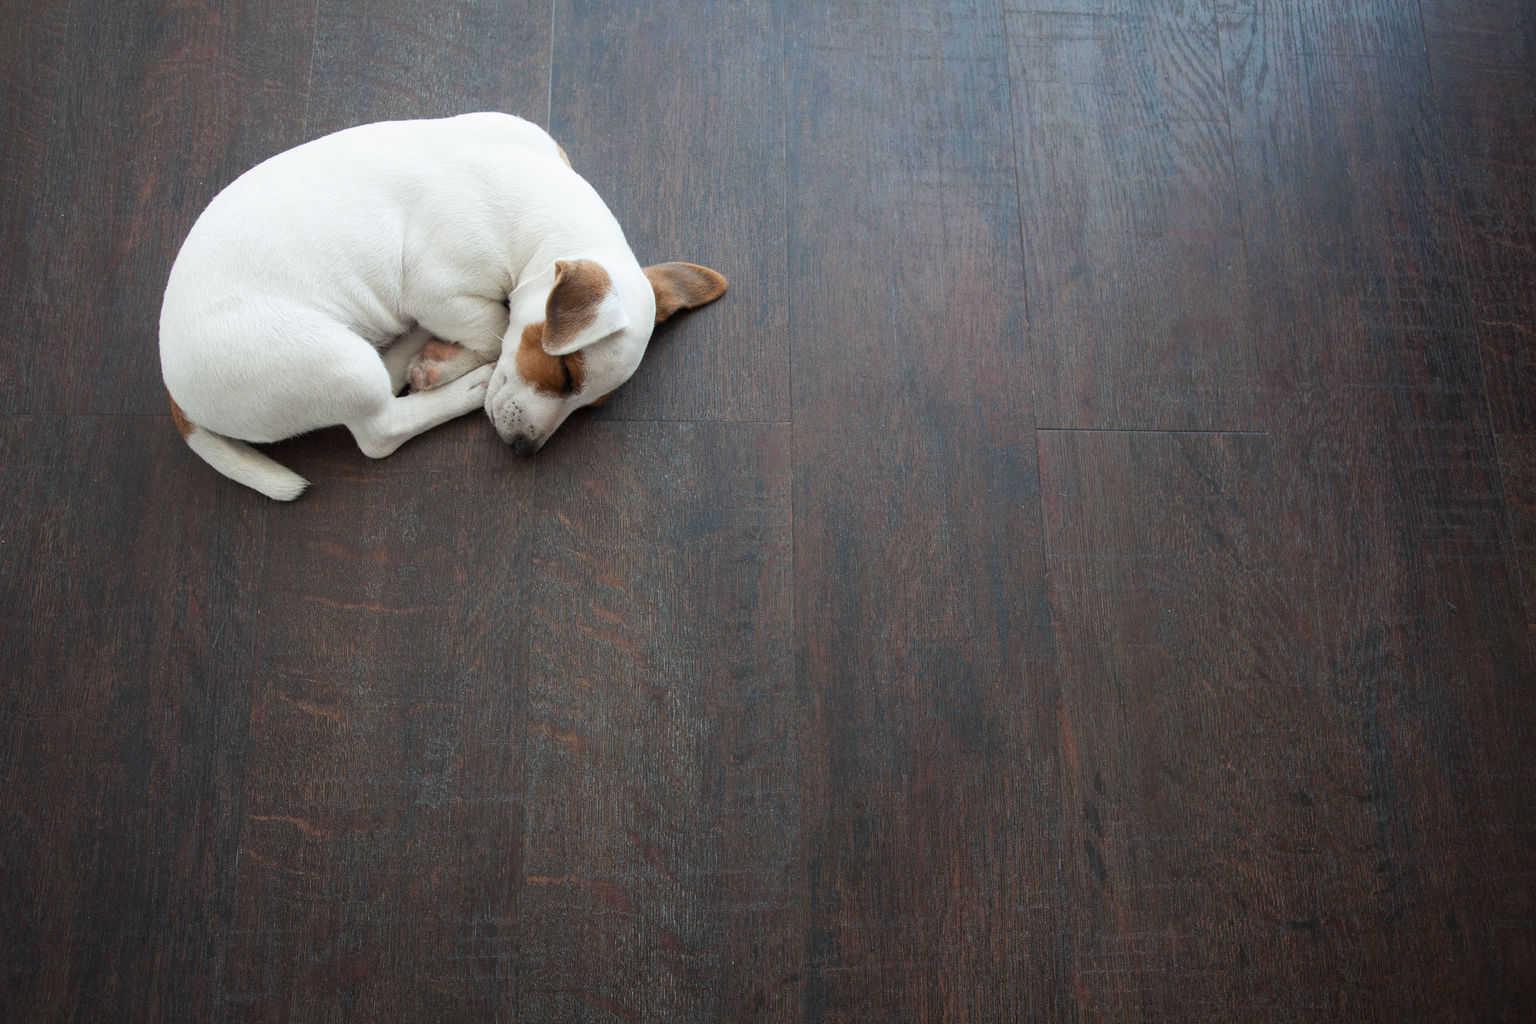 floors buckhead walnut midtown hardwood brazilian flooring products shutterstock atlanta